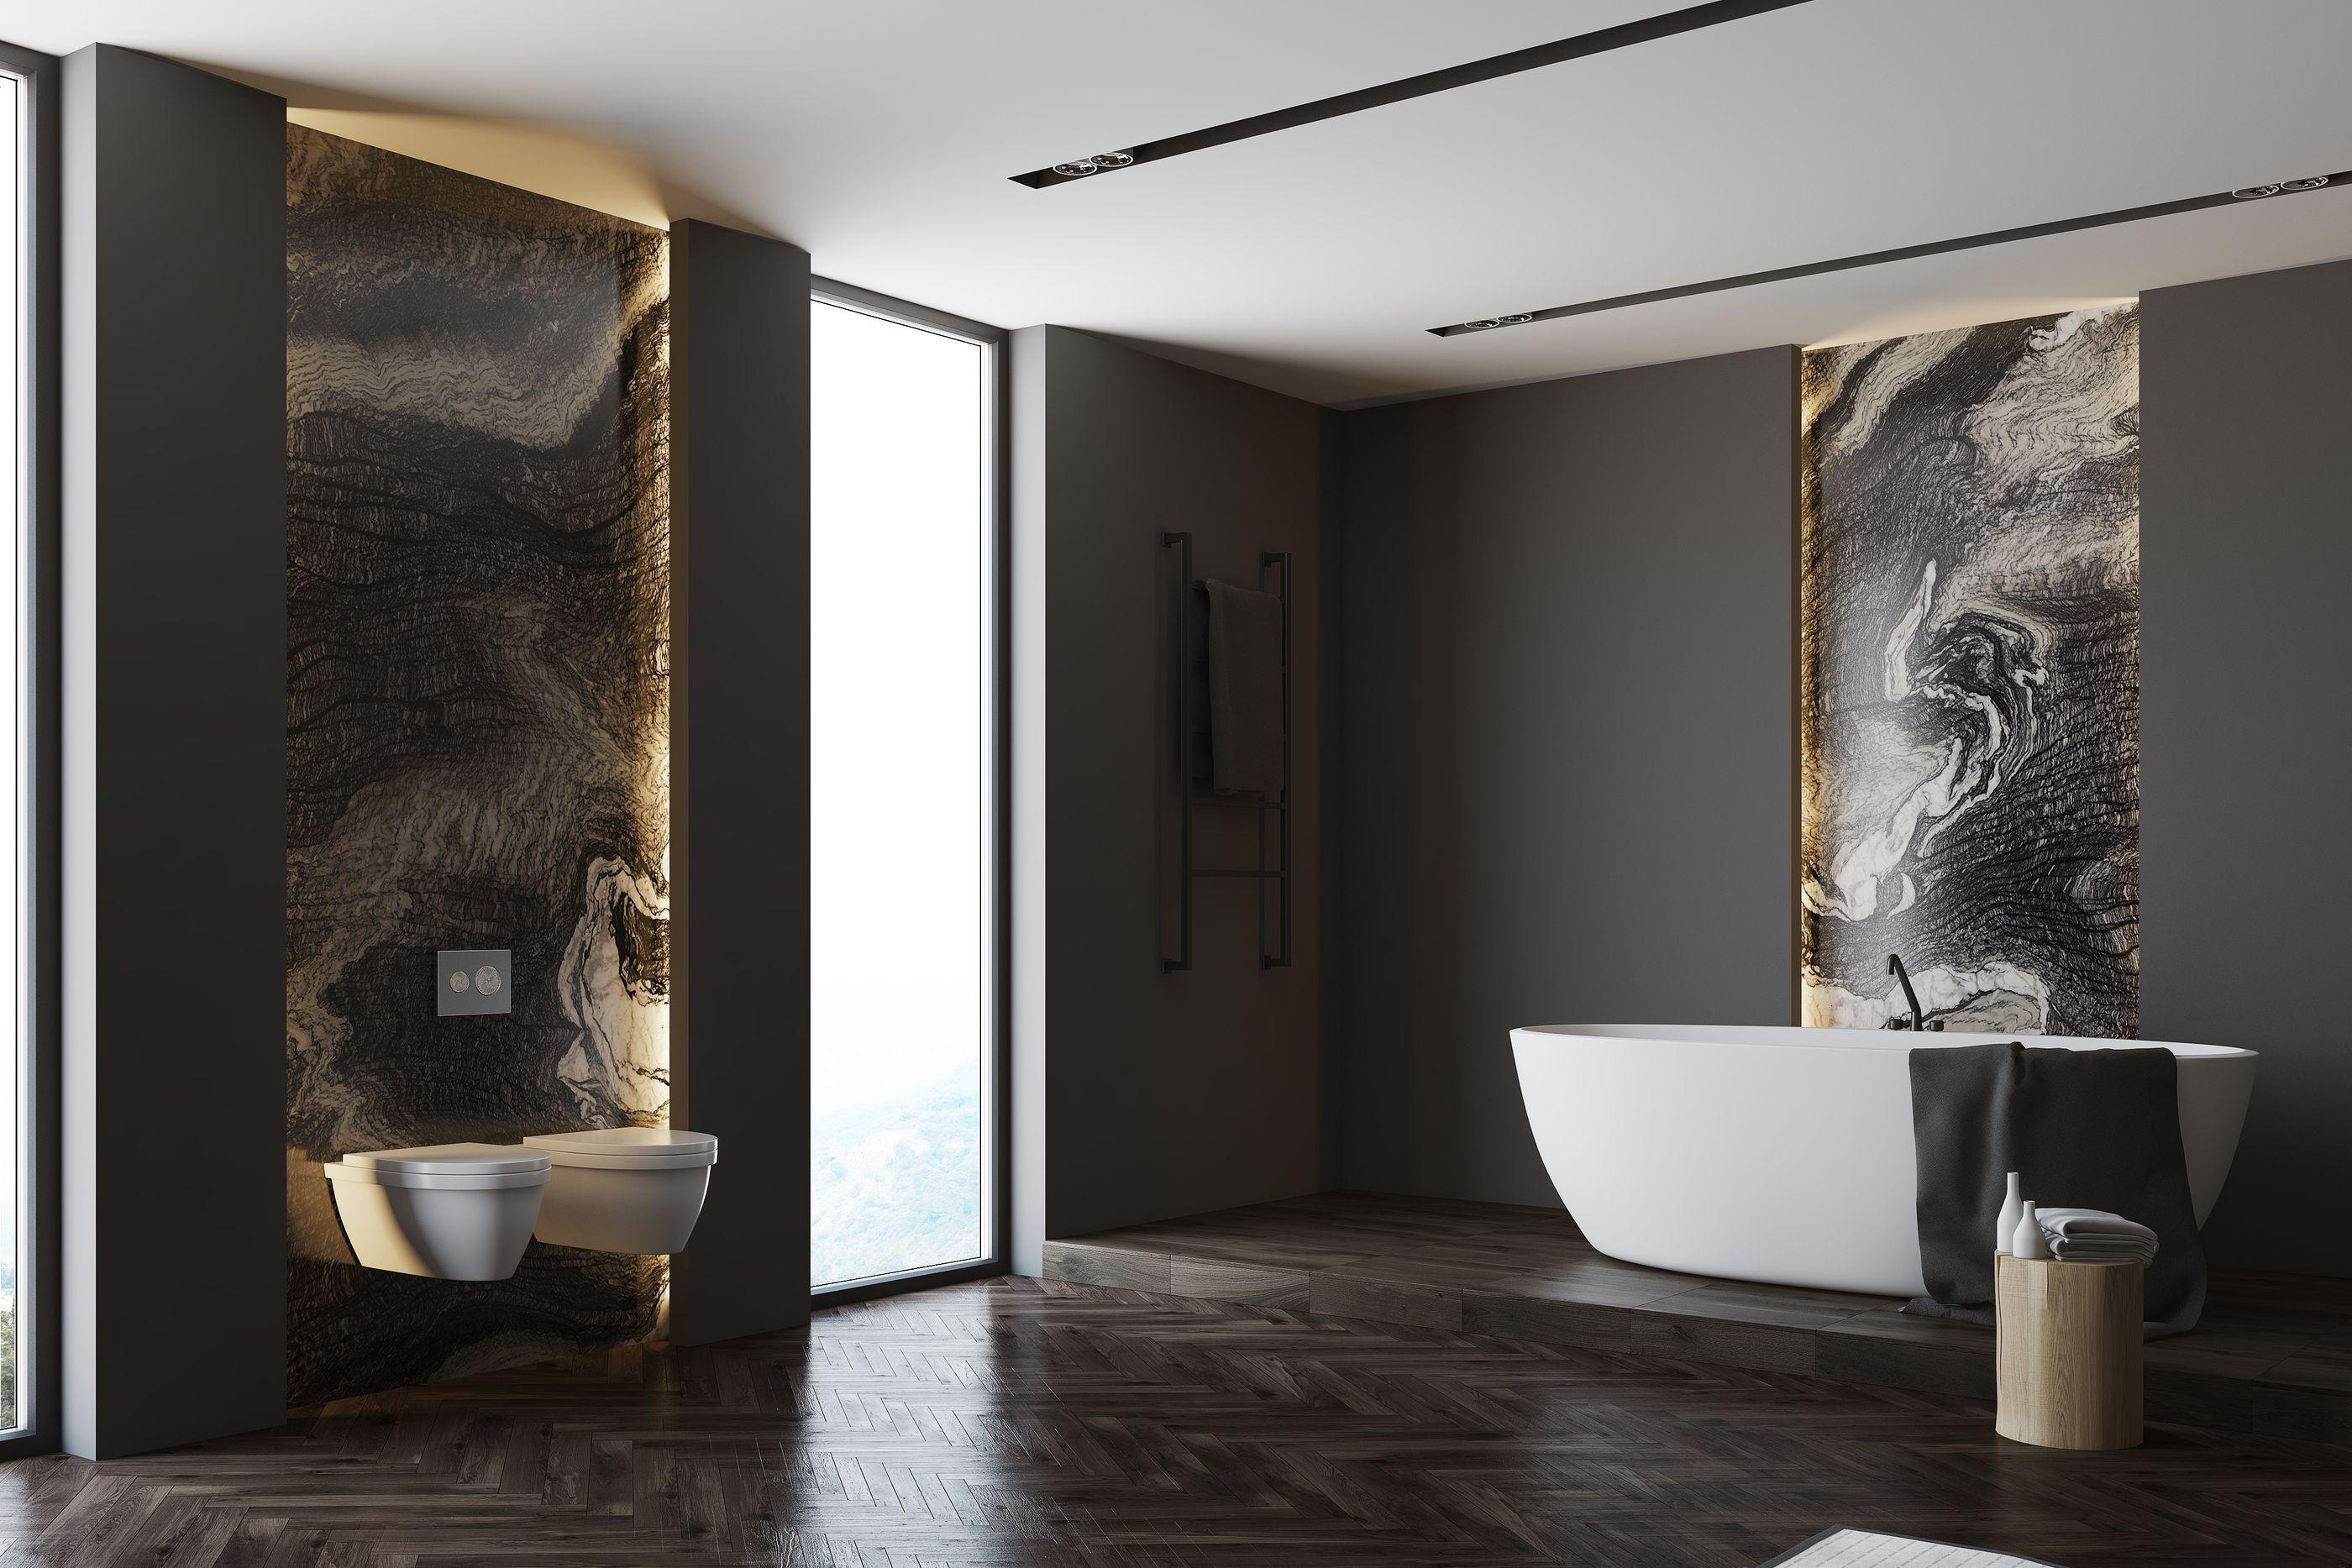 Extra Modern Black Marble Bathroom Green House Design Black Marble Bathroom Small House Interior Design